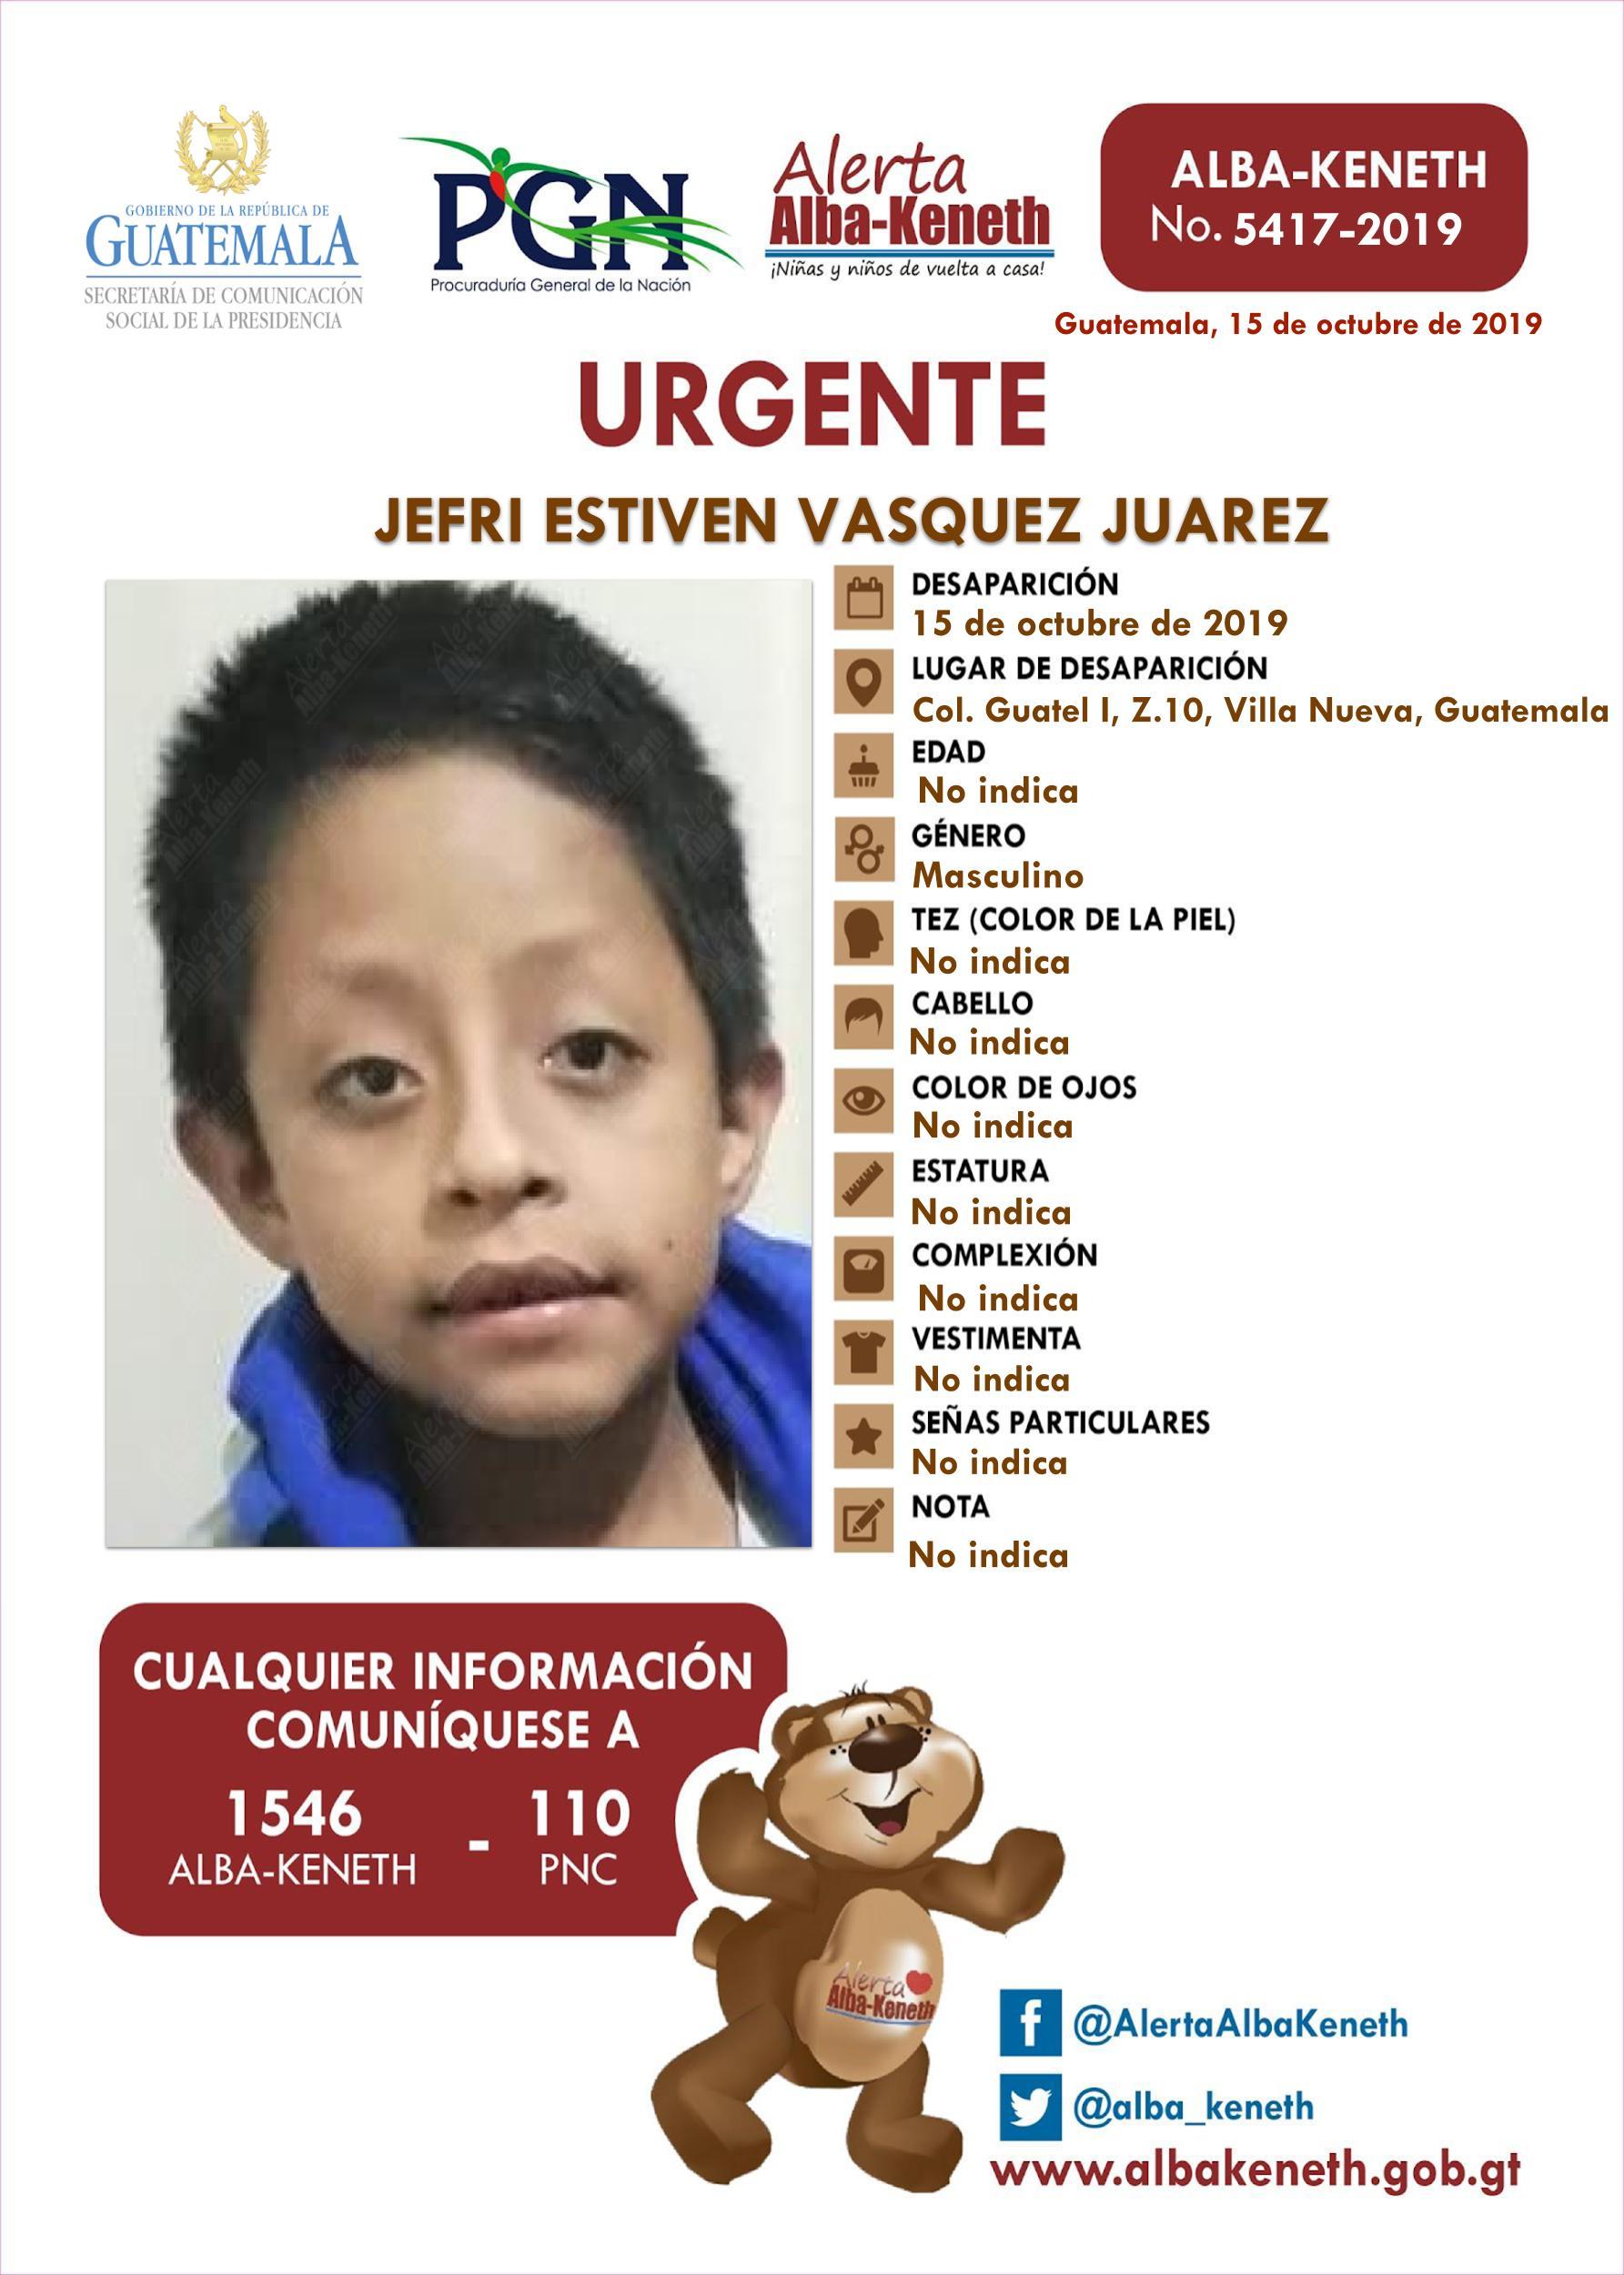 Jefri Estiven Vasquez Juarez